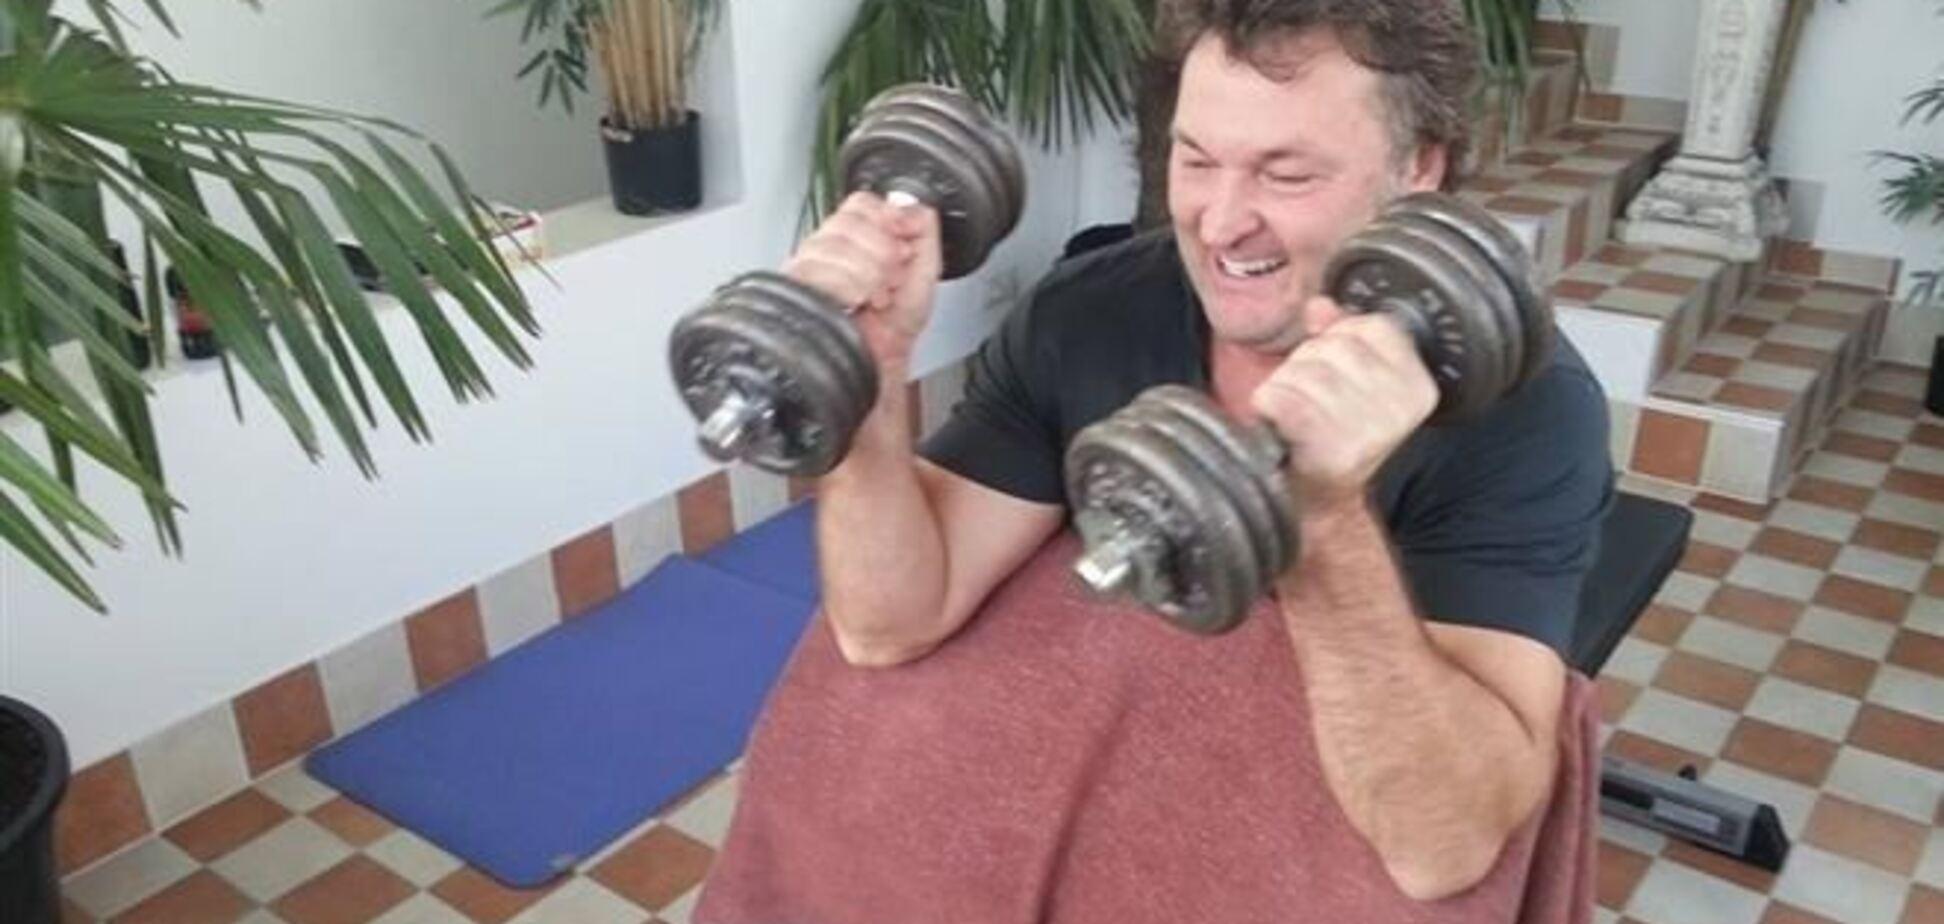 Экс-депутат показал накачанные мышцы